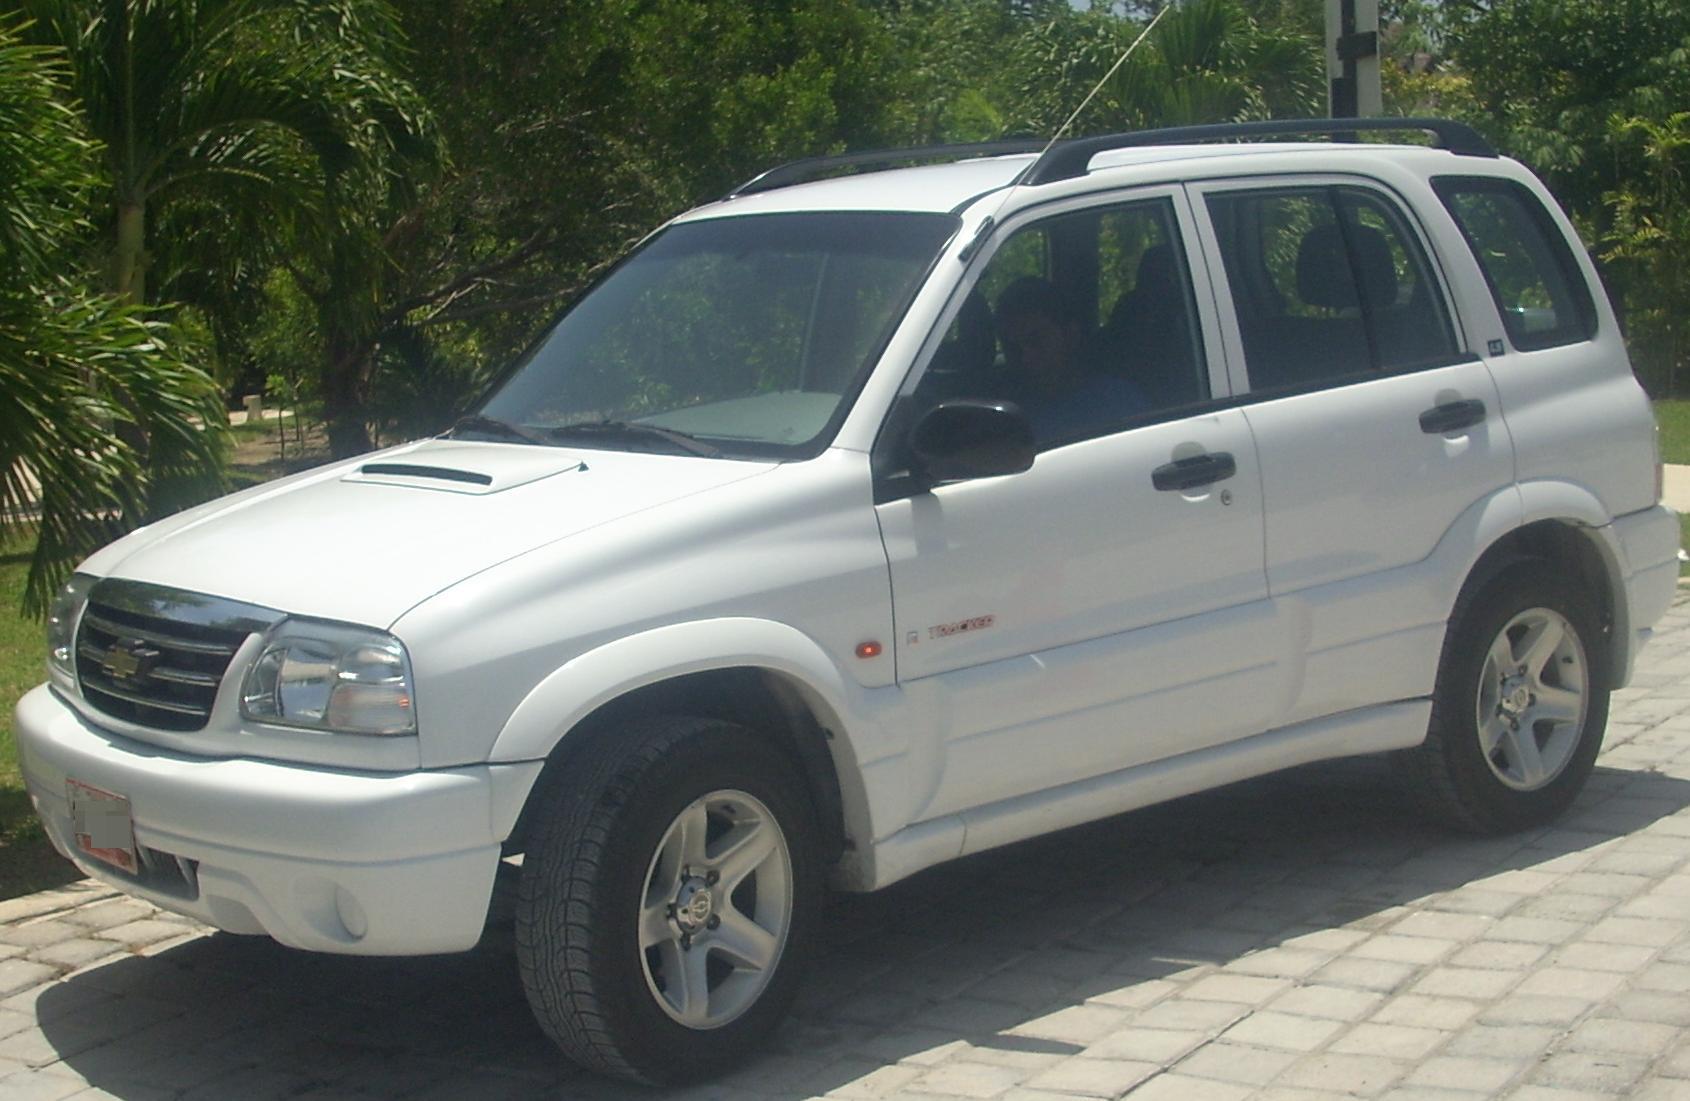 Chevrolet Tracker 2002 foto - 4